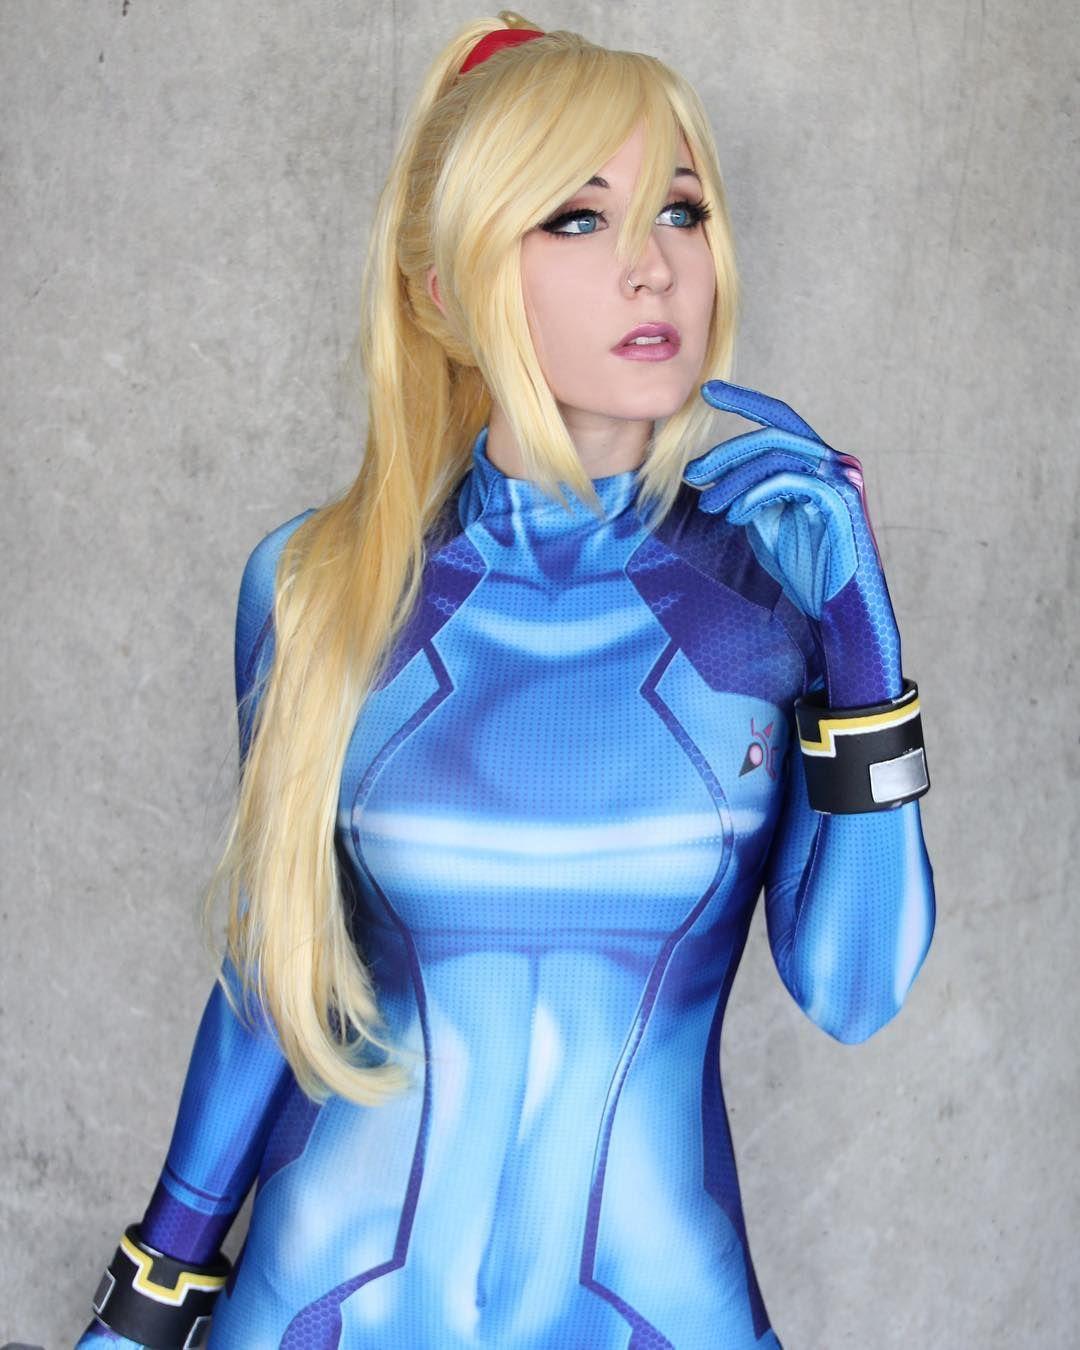 zero suit samus cosplay by beautifulxxpoison on DeviantArt